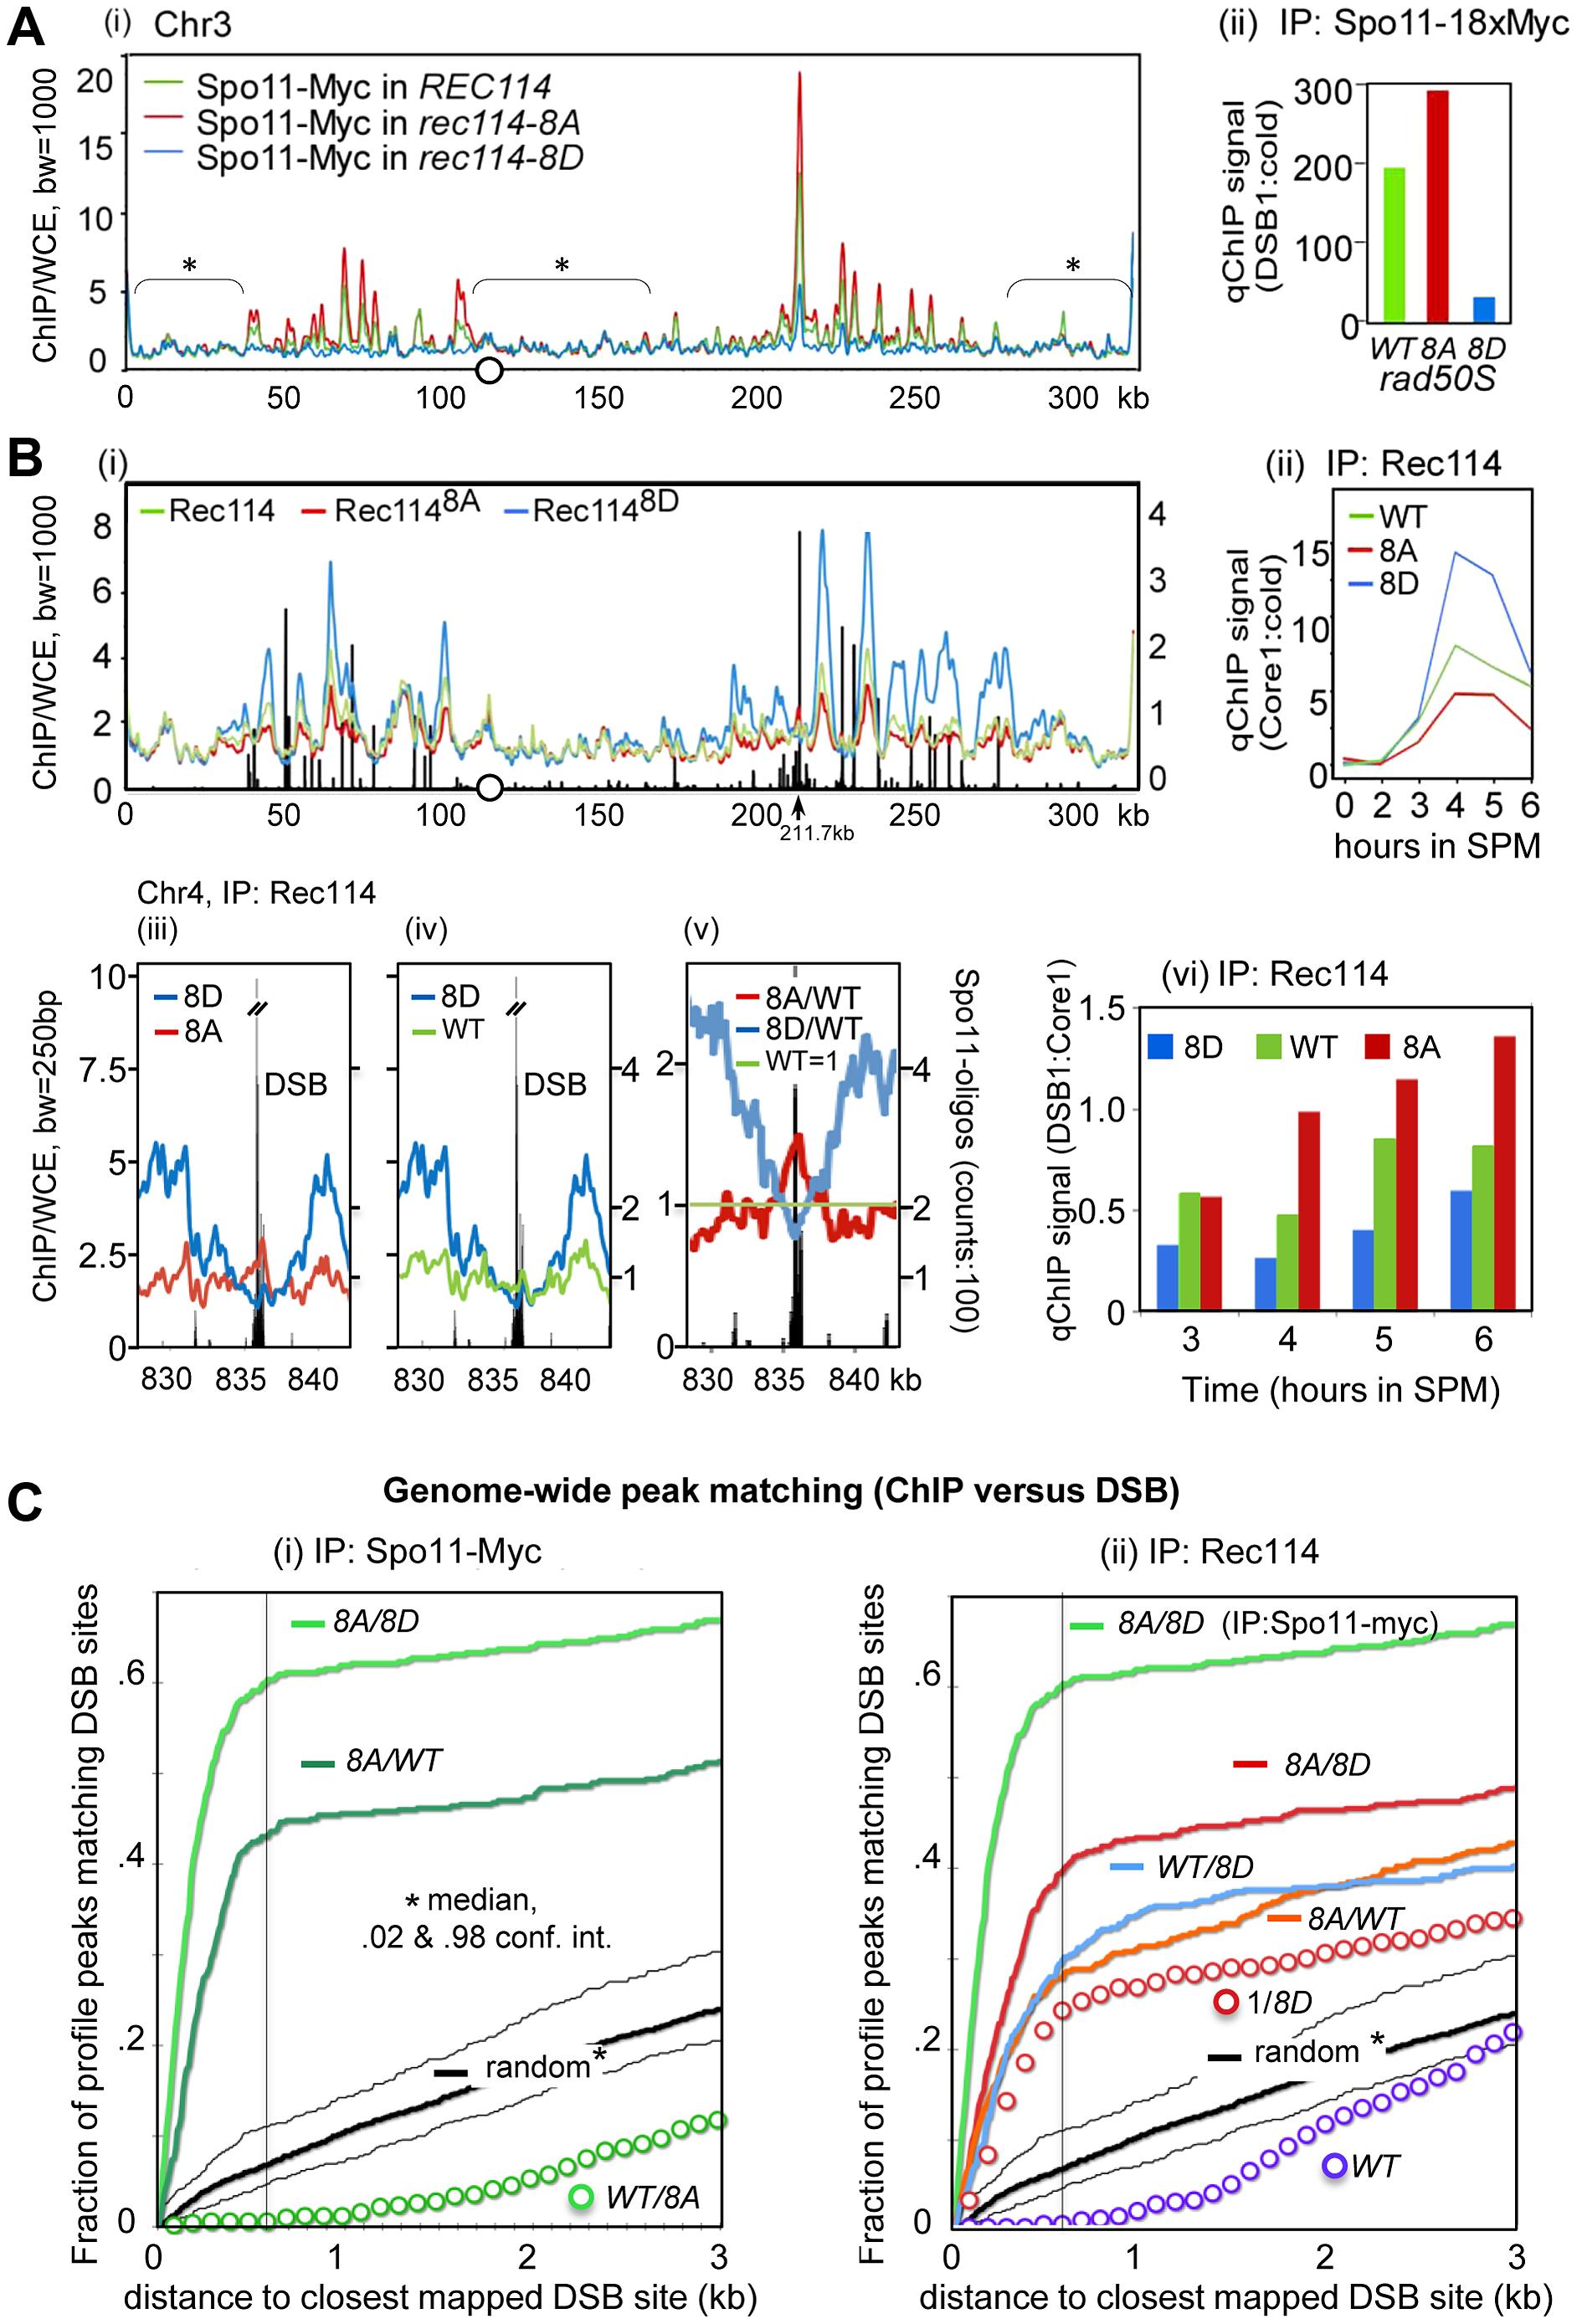 Rec114 phosphorylation down-regulates Spo11 catalysis and Rec114-DSB hotspot association.